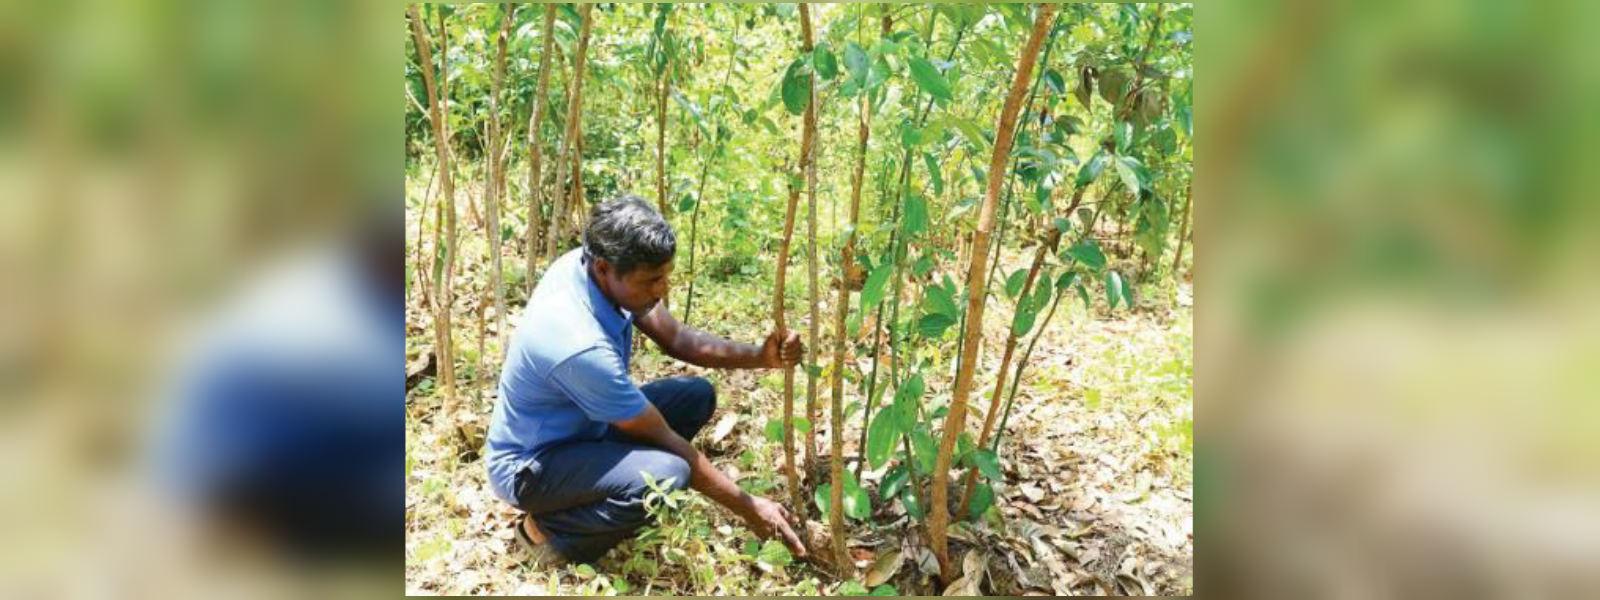 Declining price of cinnamon threaten farmers' livelihoods